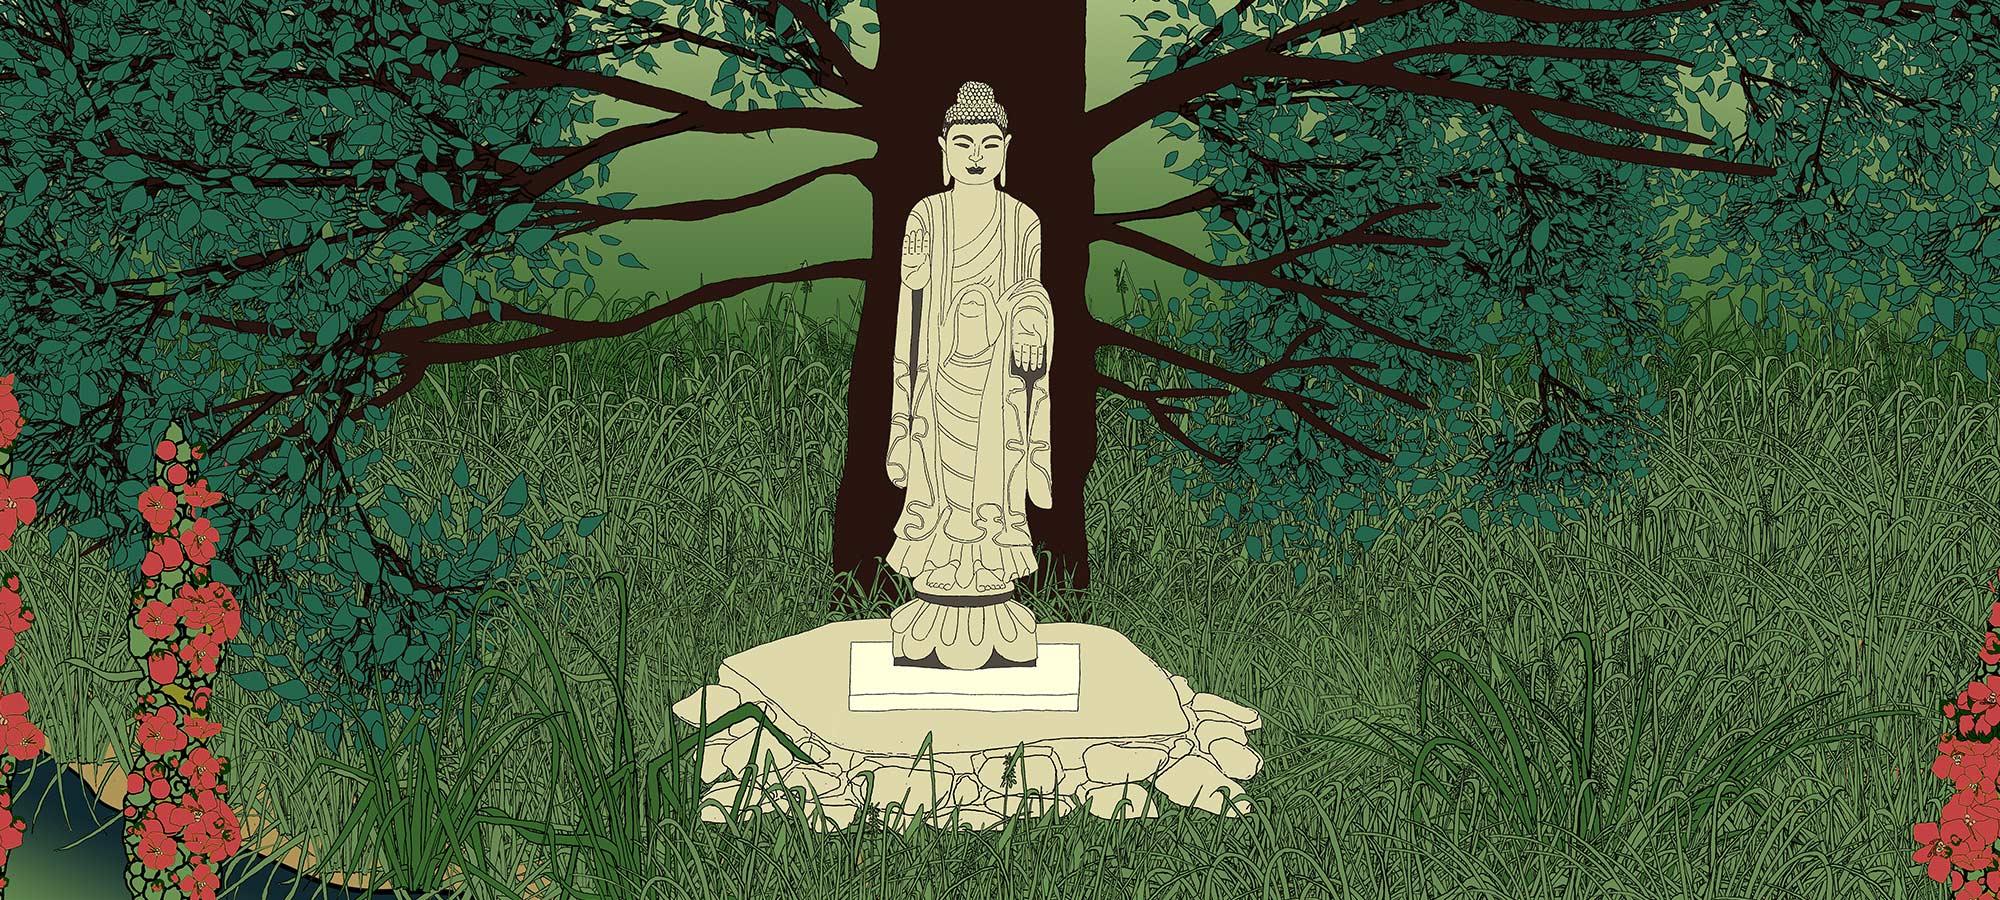 ZBZS, ZEN, 5 klassische Hindernisse der Meditation, Keizan Plempe Sensei